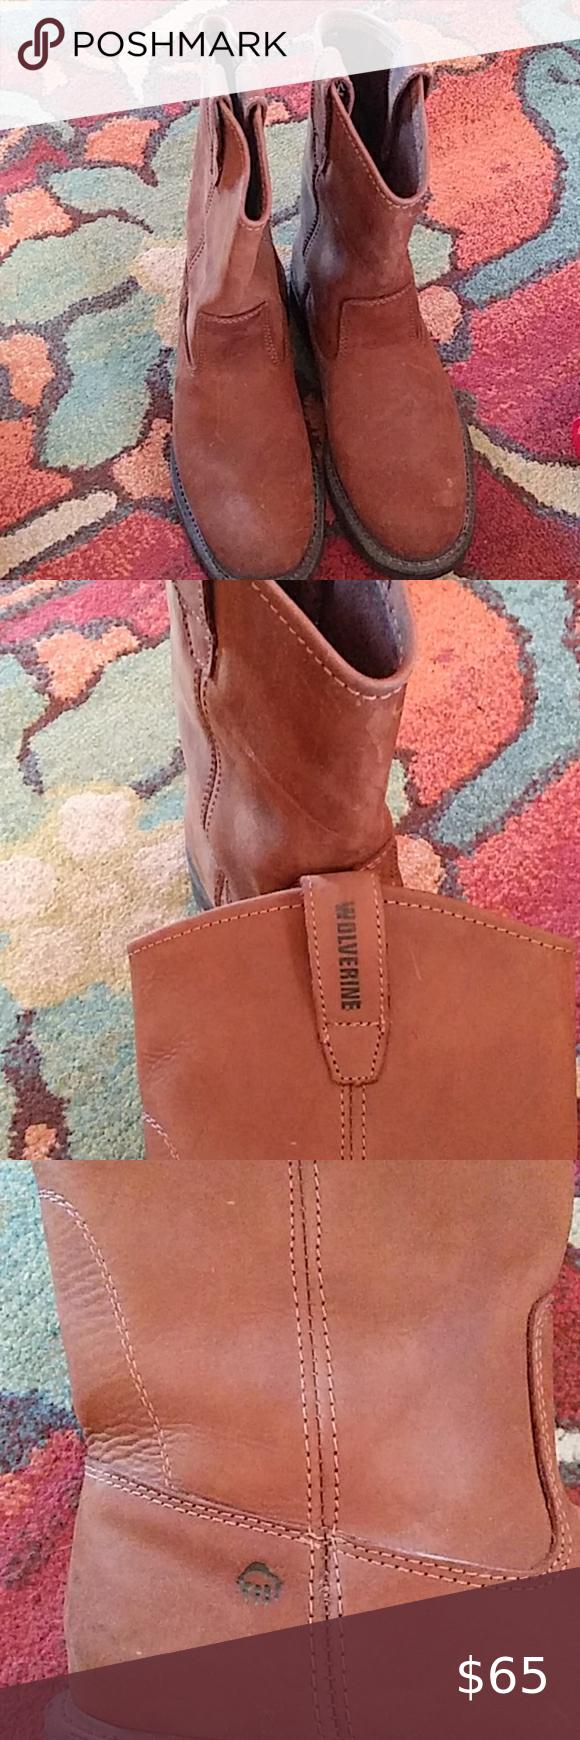 Wolverine brand boots in 2020